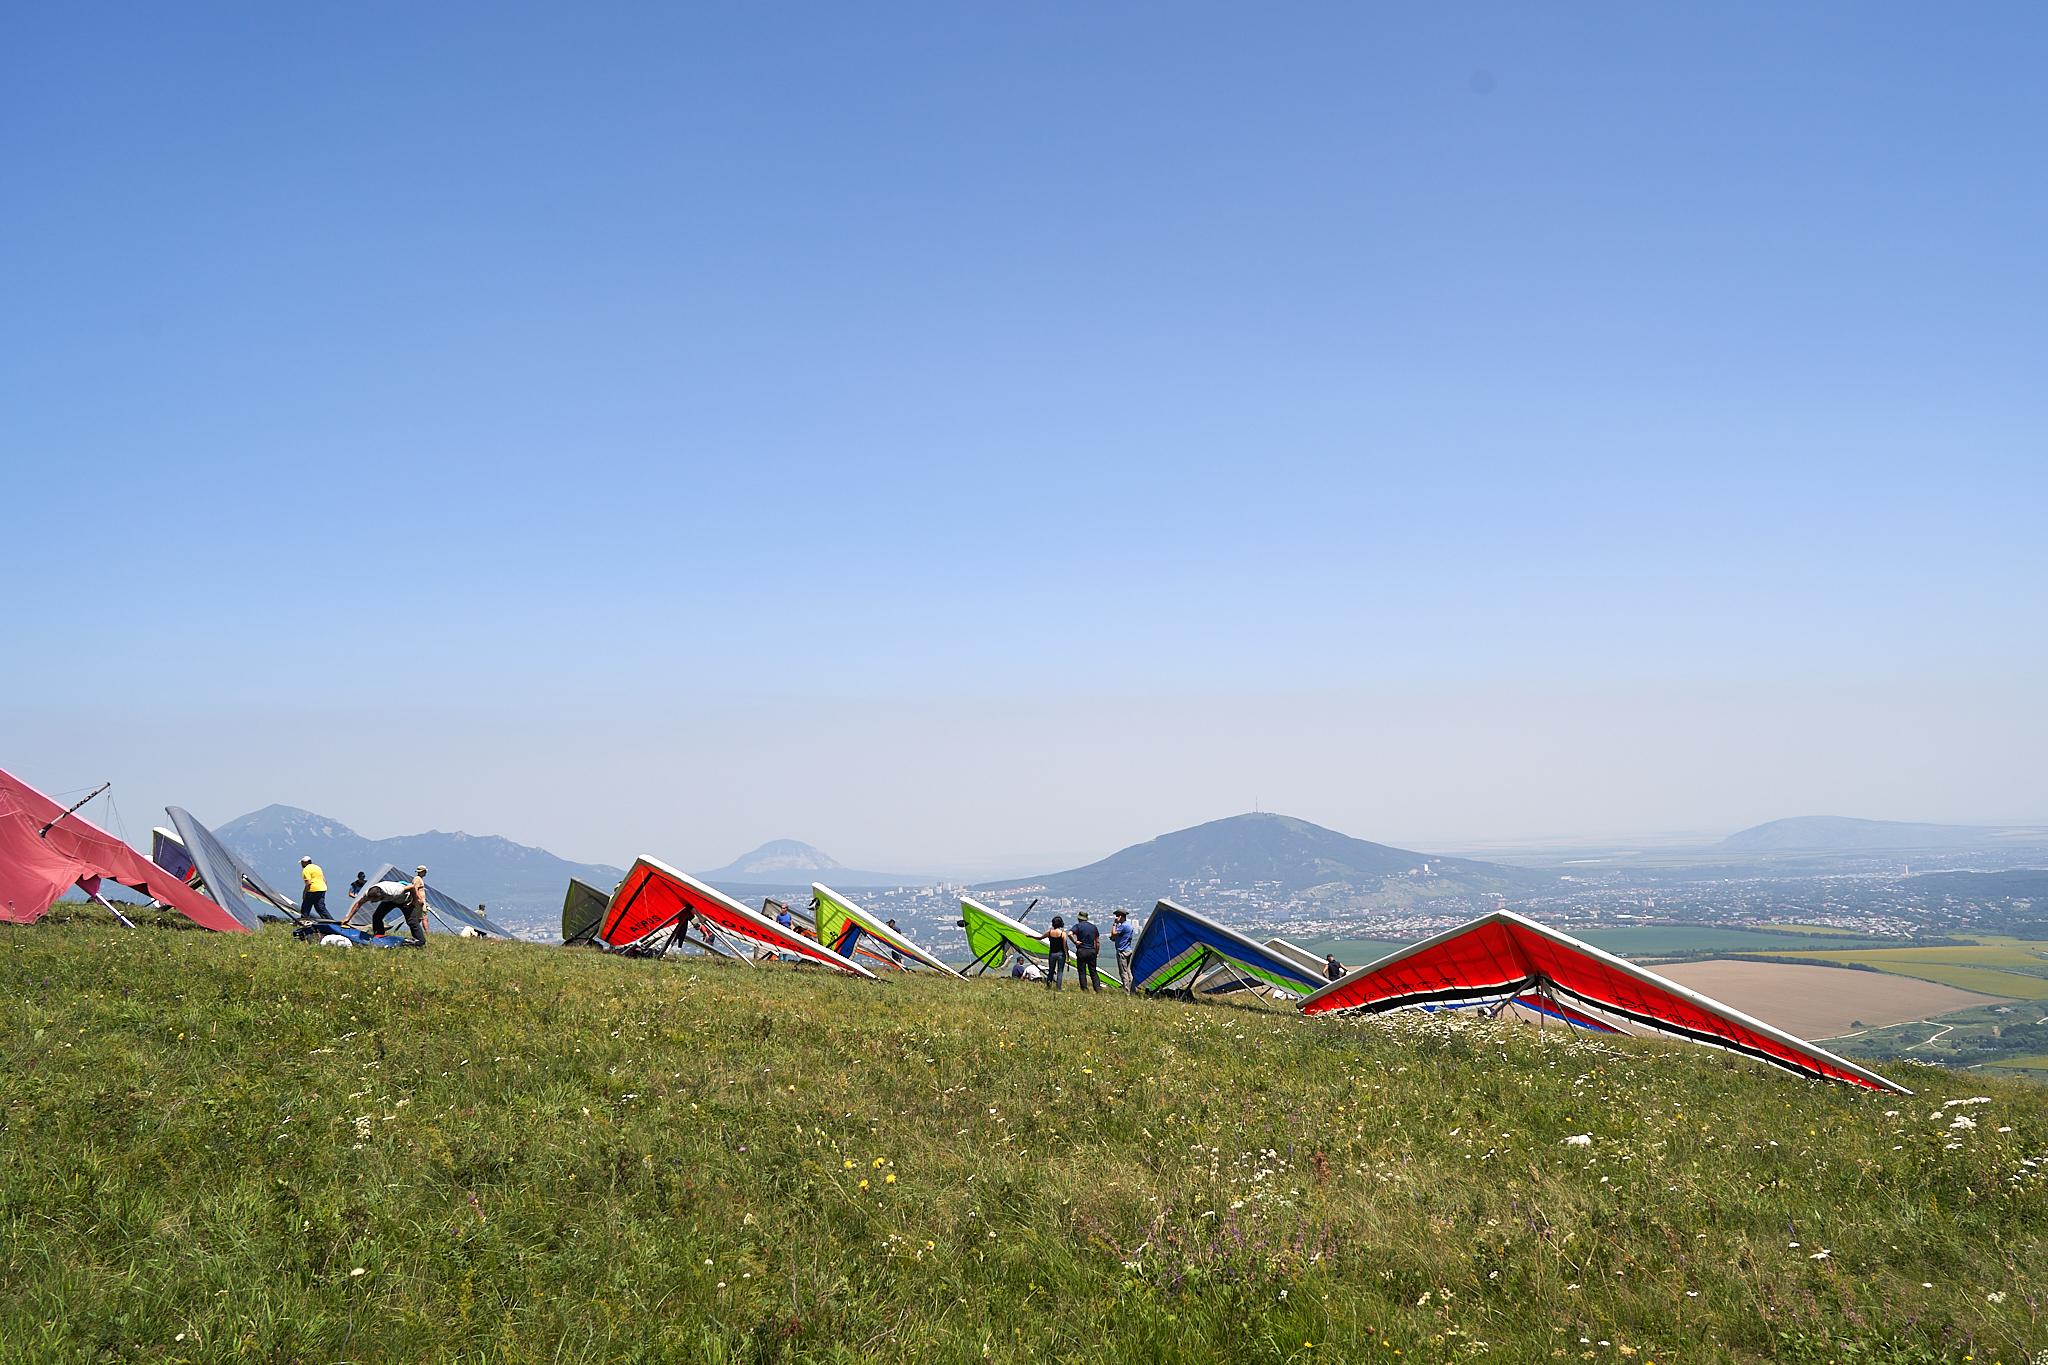 Hang gliders: topless VS king-posted - Дельтаплан: топлес или мачтовый?